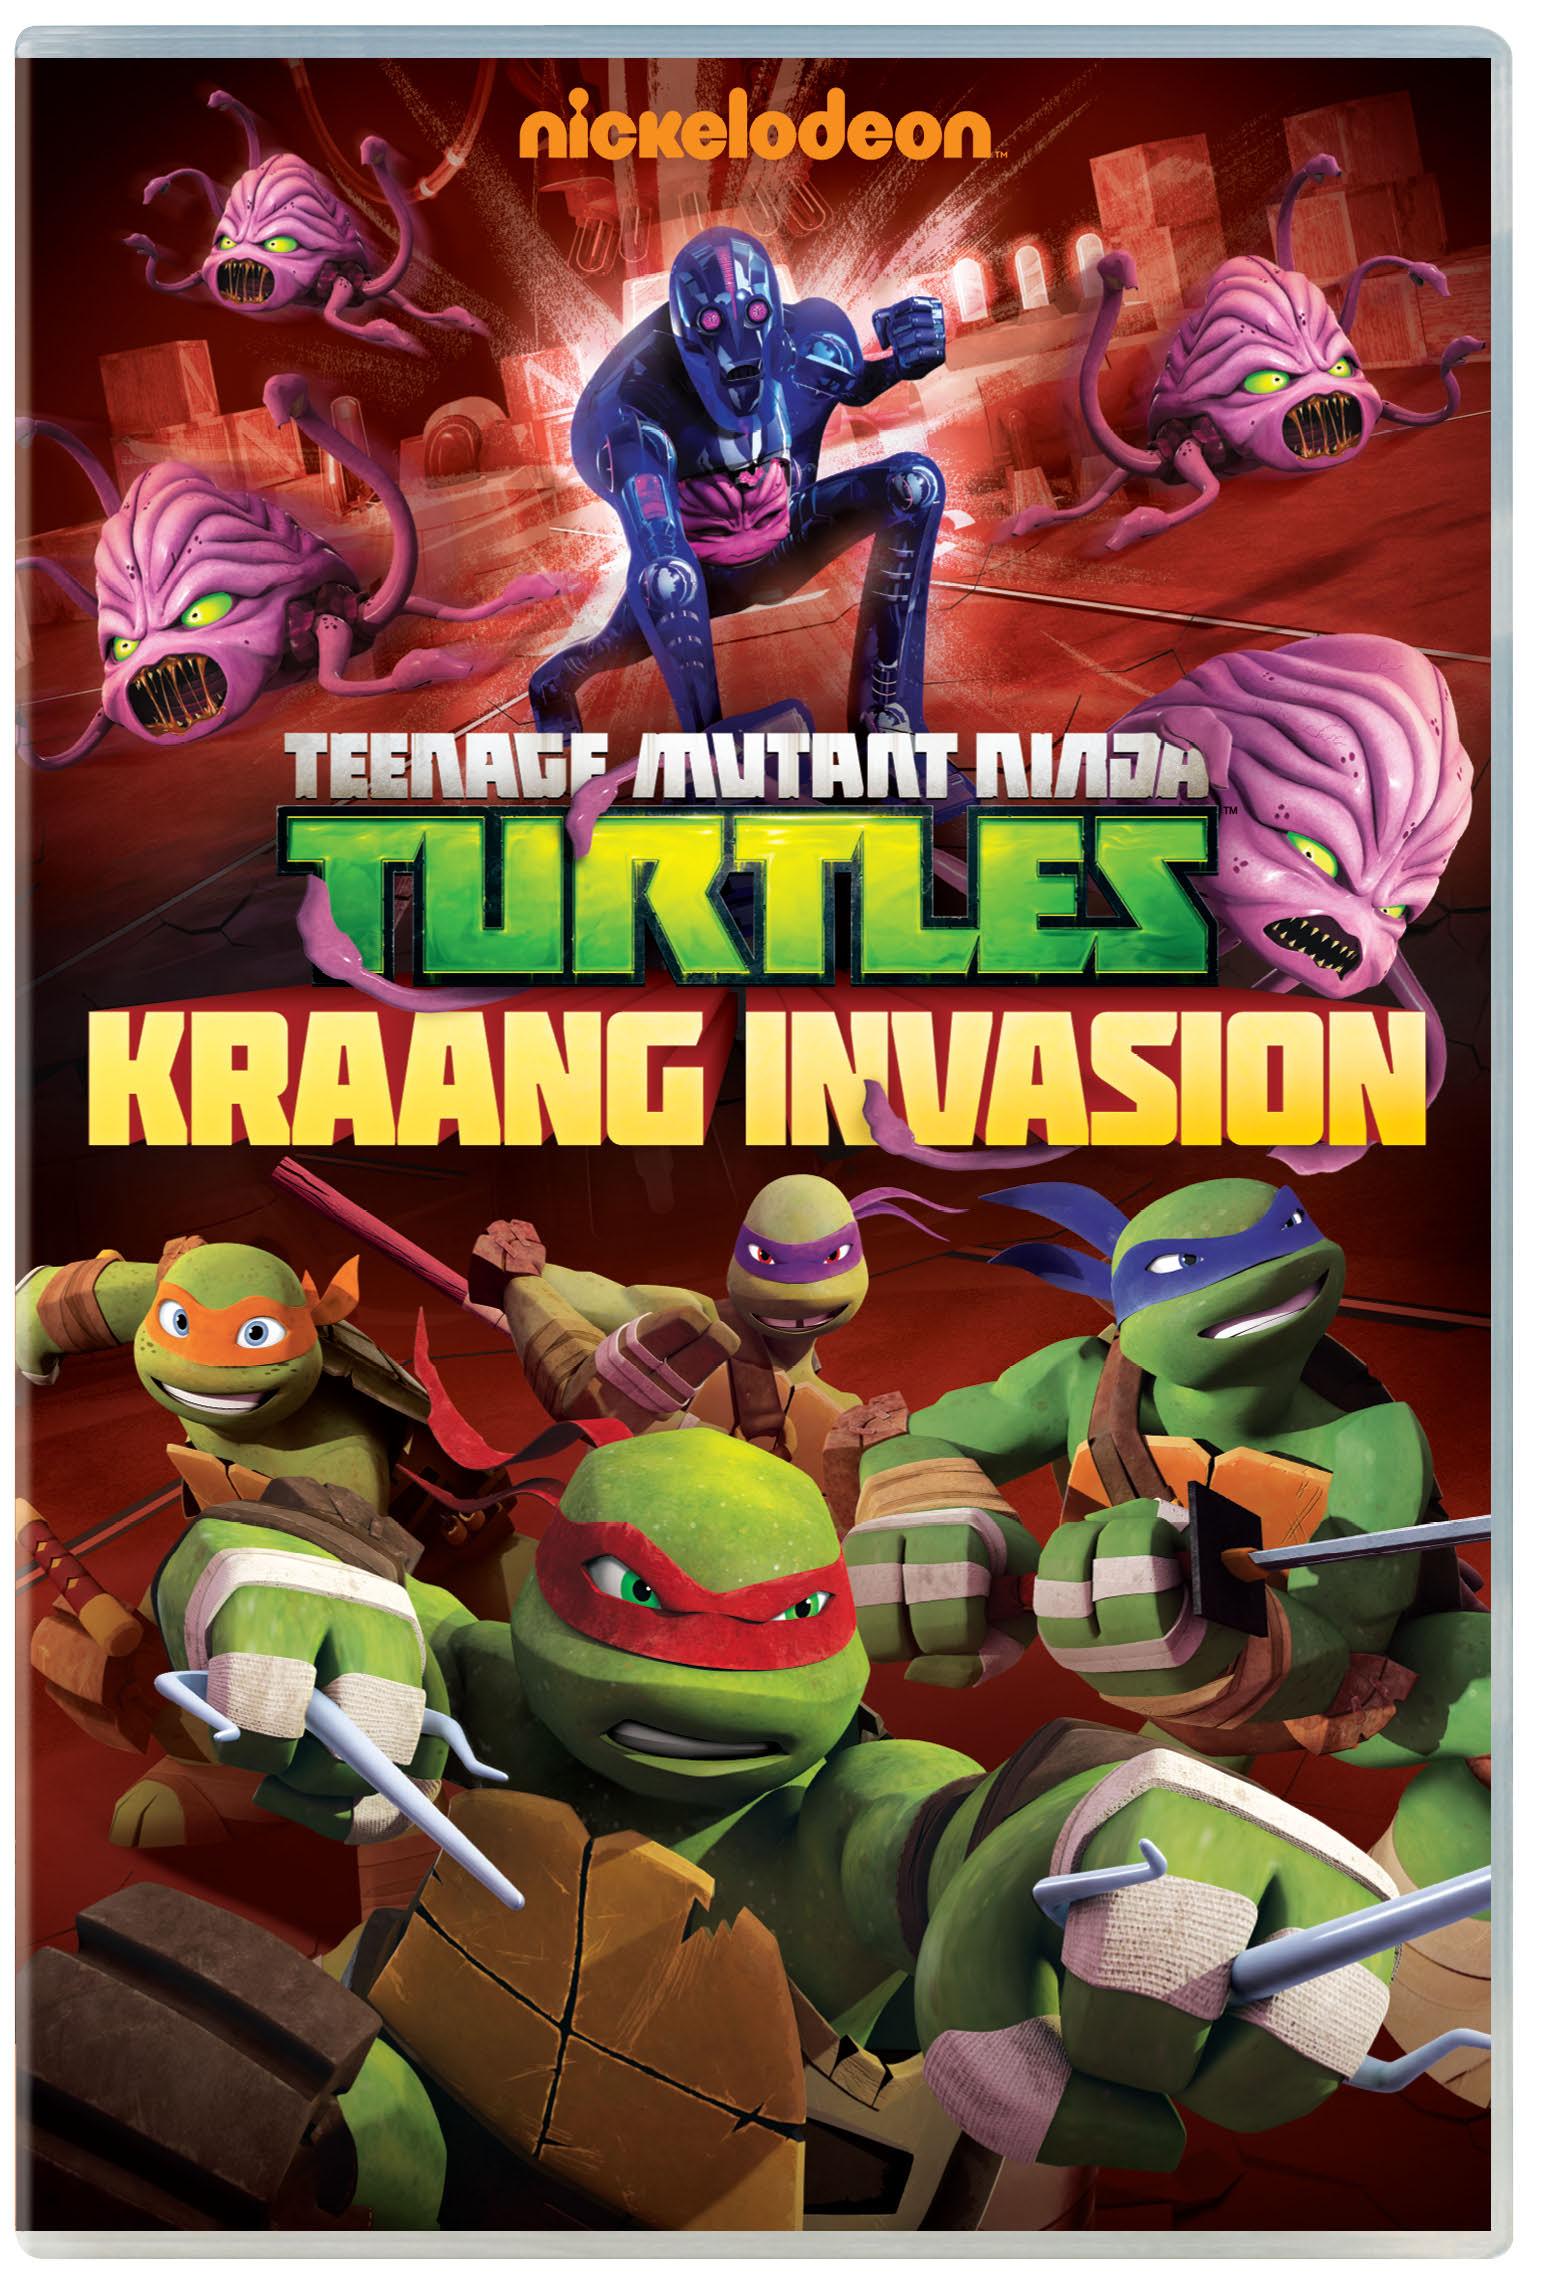 Wojownicze Żółwie Ninja: Inwazja Kraangów / Teenage Mutant Ninja Turtles: Kraang Invasion